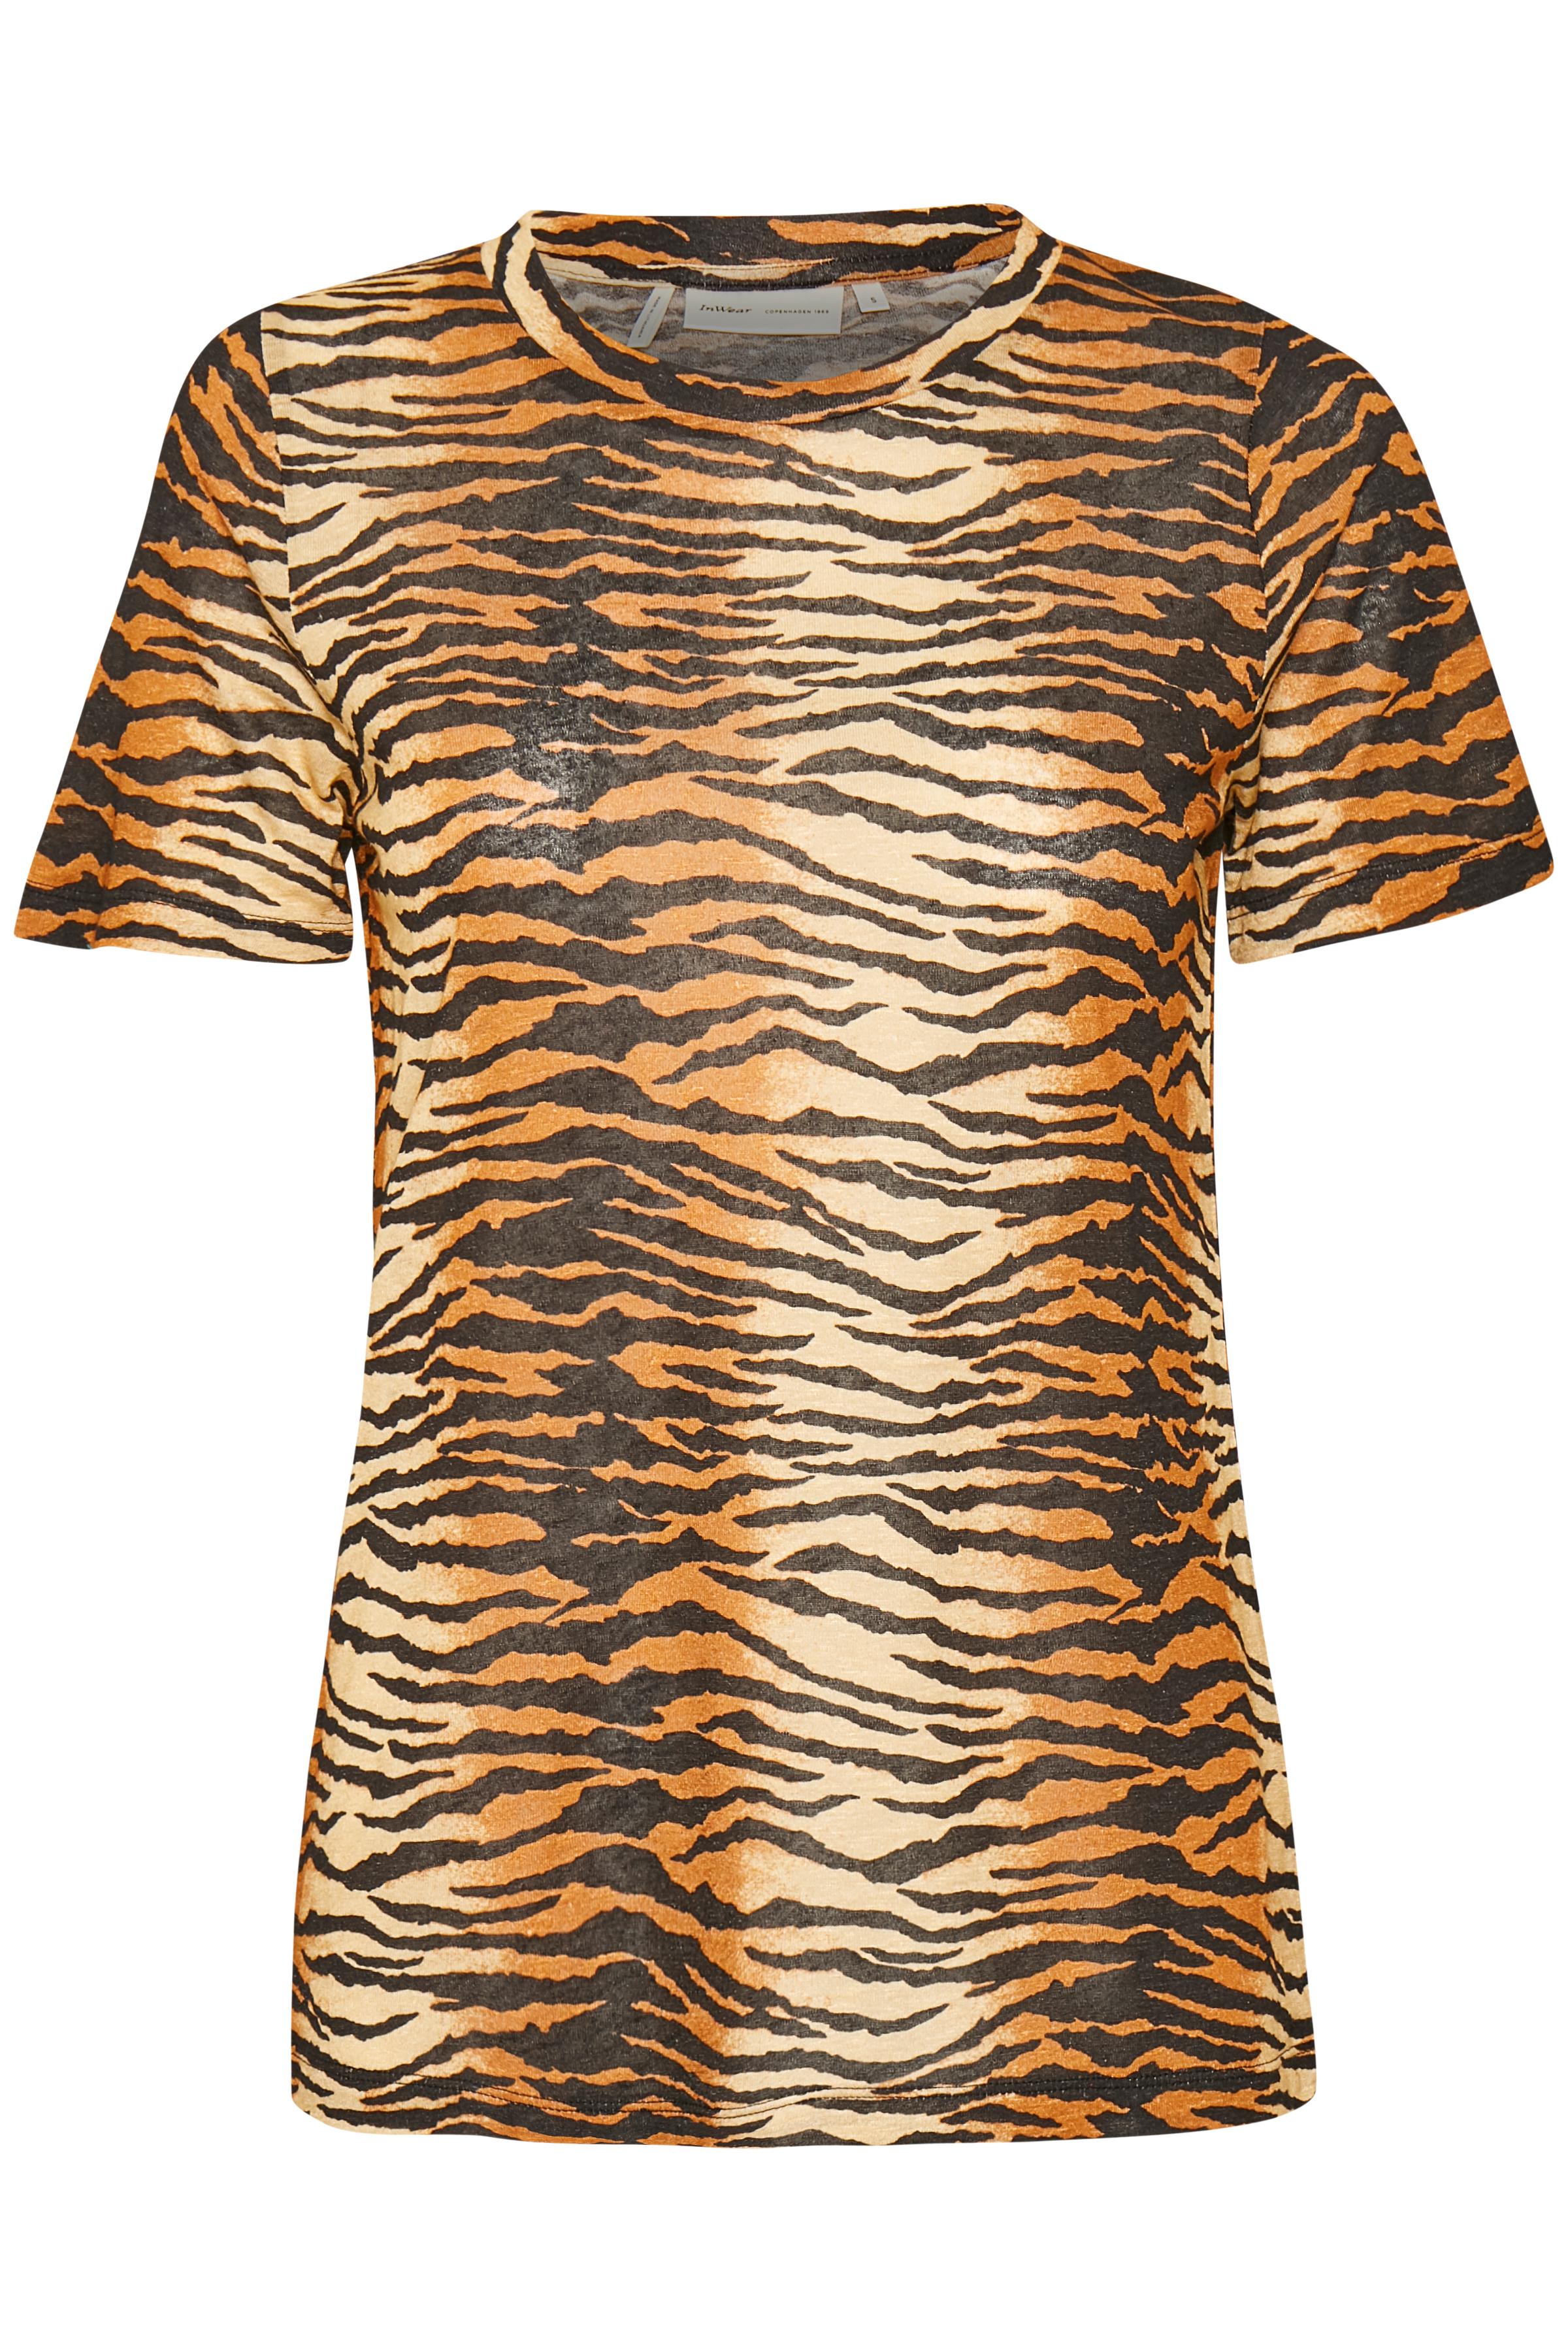 Brown Tiger Stripe